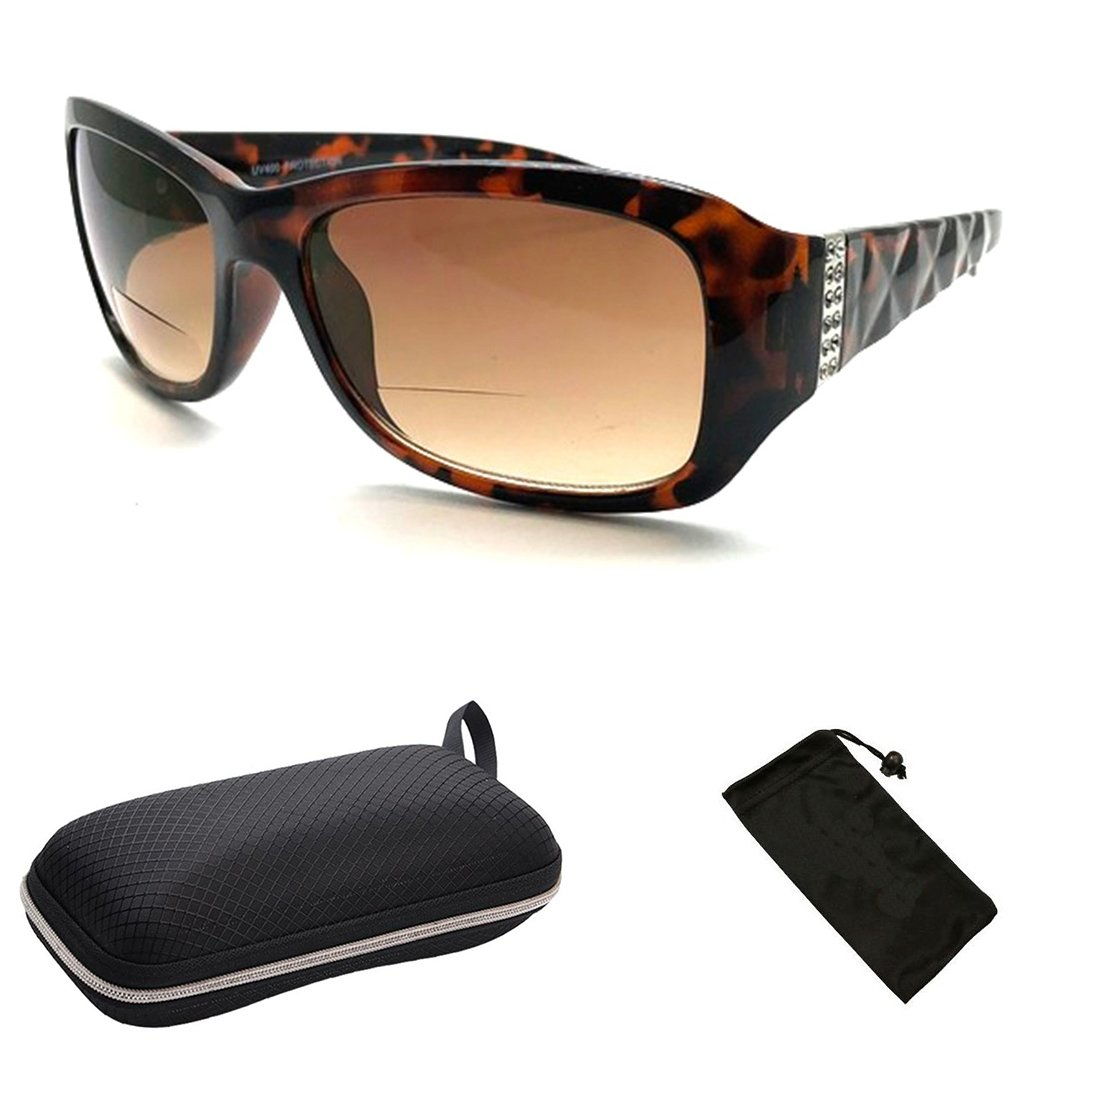 Bifocal Sun Readers All in One Women Premium Designer Fashion Sunglasses Reading Glasses (Tortoise, 2.50)